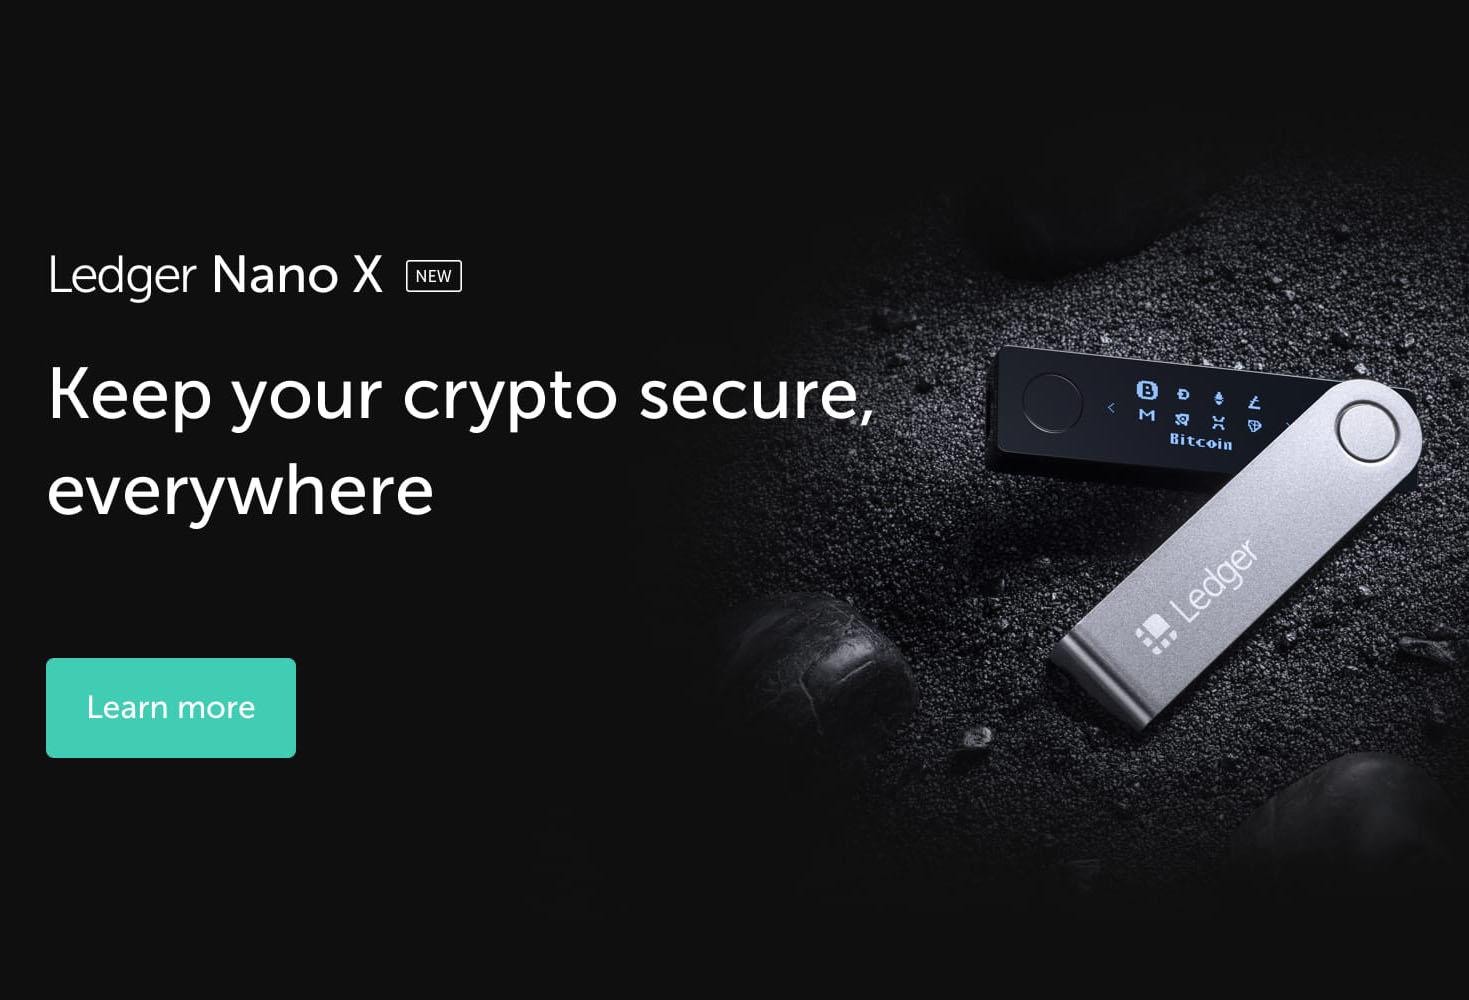 Ledger Nano X: Complete setup guide